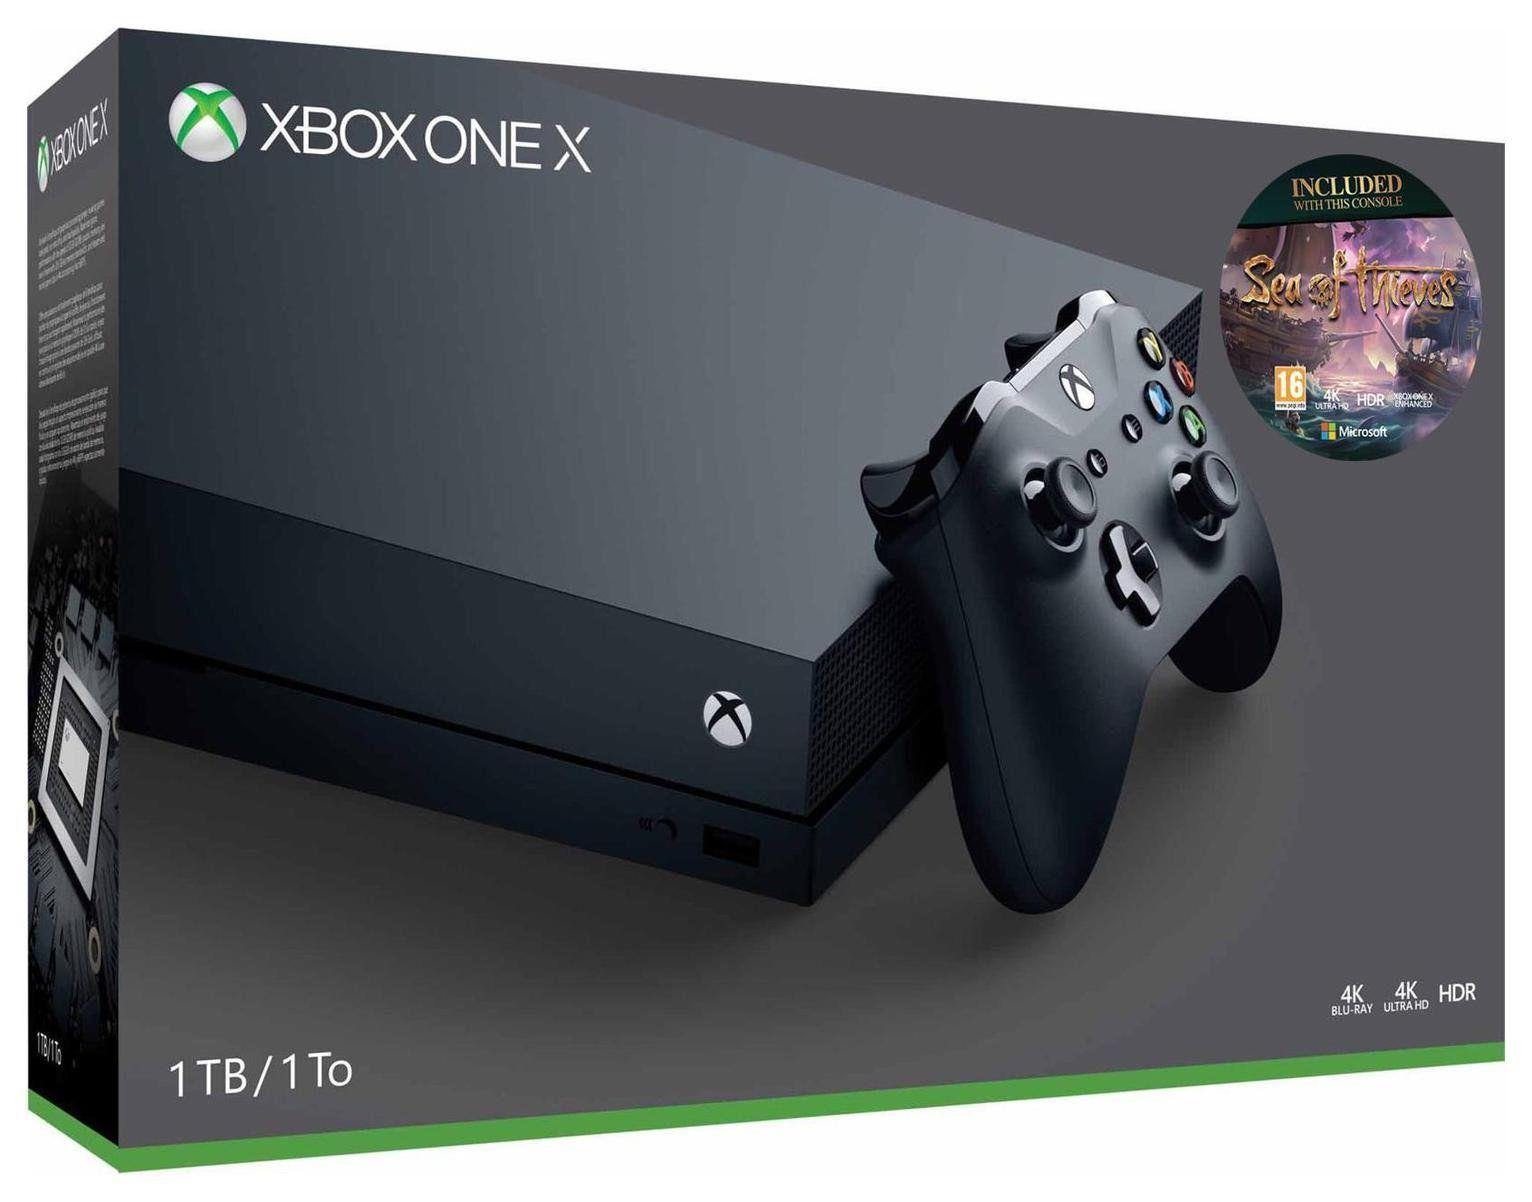 Microsoft Xbox One X 1TB 4K Gaming Console - Black (refurb) + SEA OF THIEVES £278.99 at Argos eBay